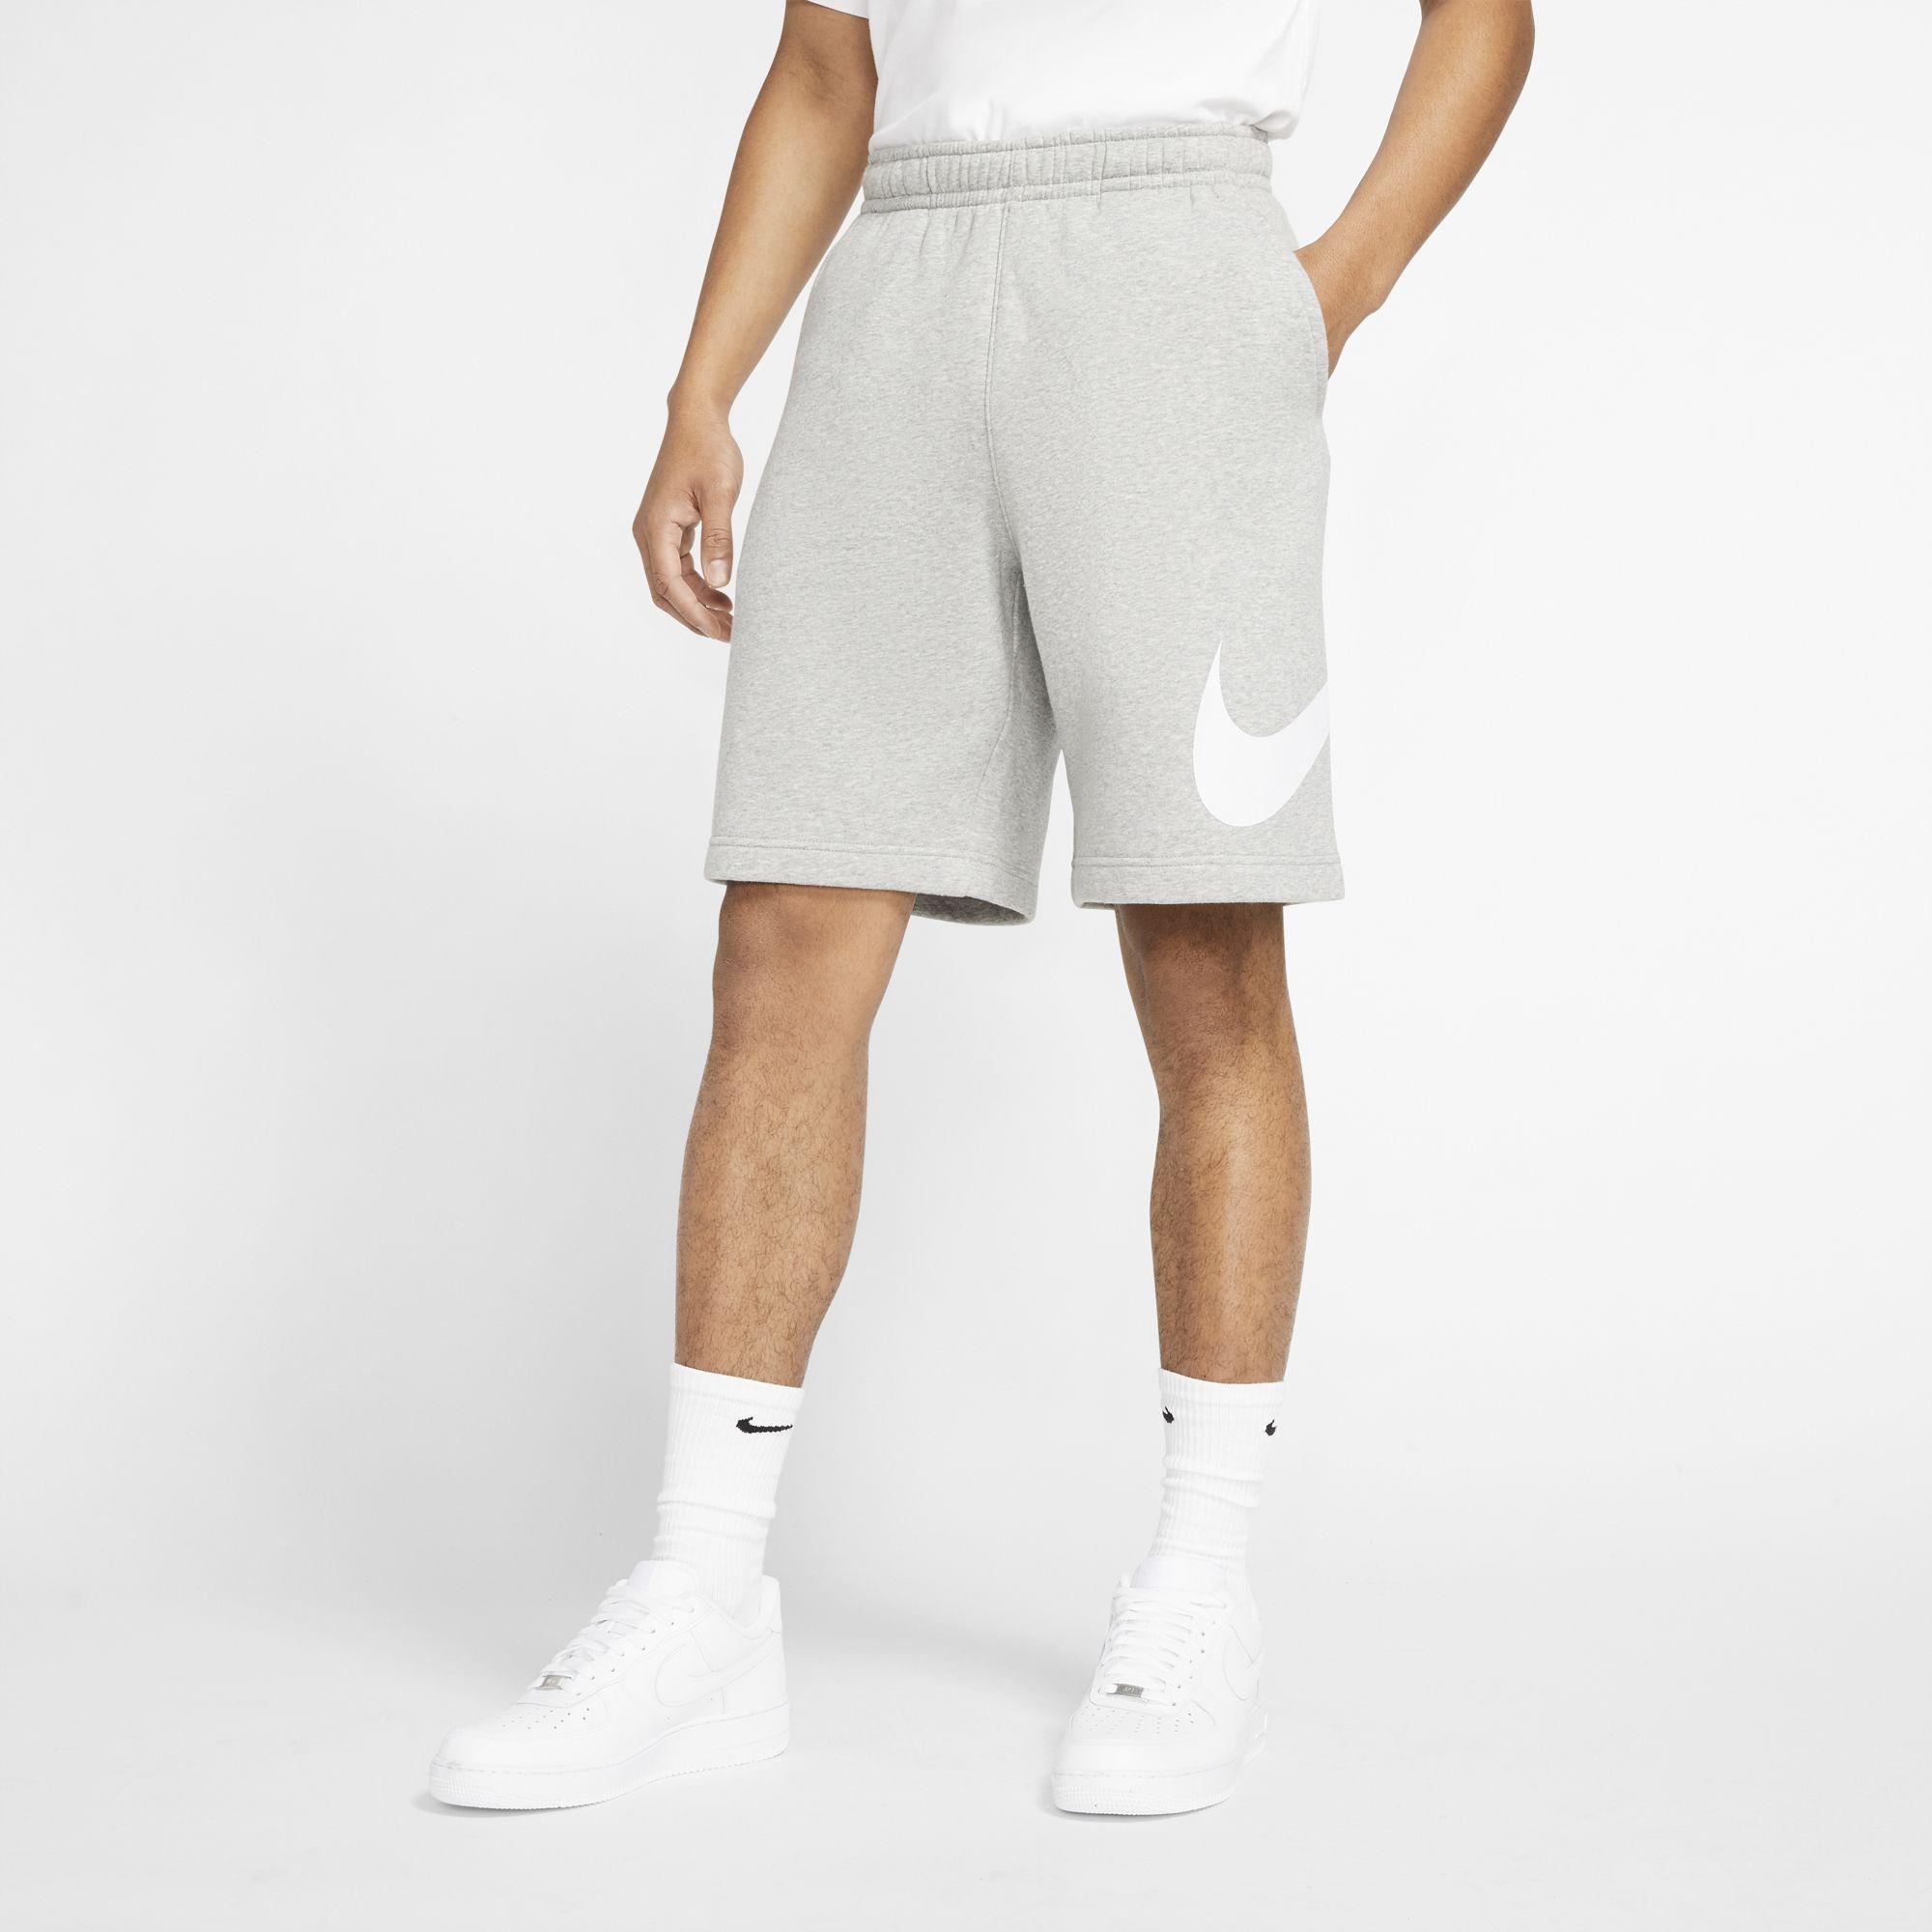 Men's Sportwear Club Graphic Shorts, Heather Gray, swatch